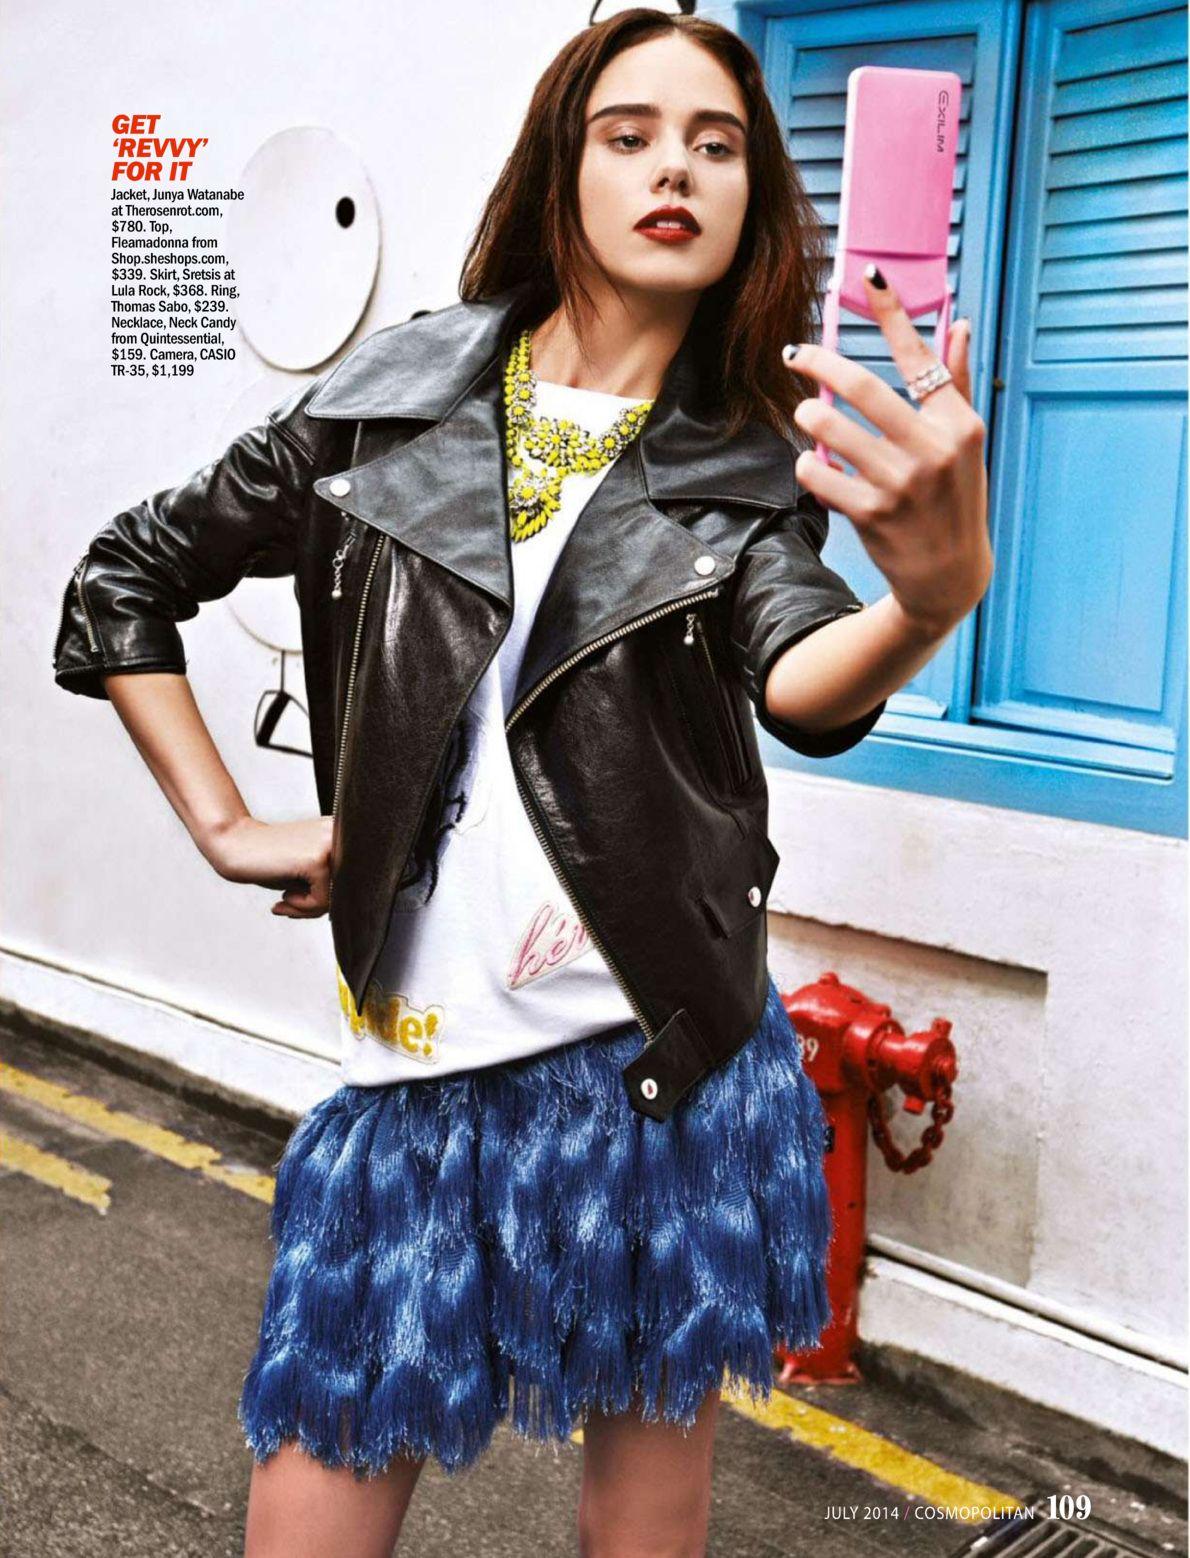 """Shoot To Thrill"" - Cosmopolitan Singapore July 2014"